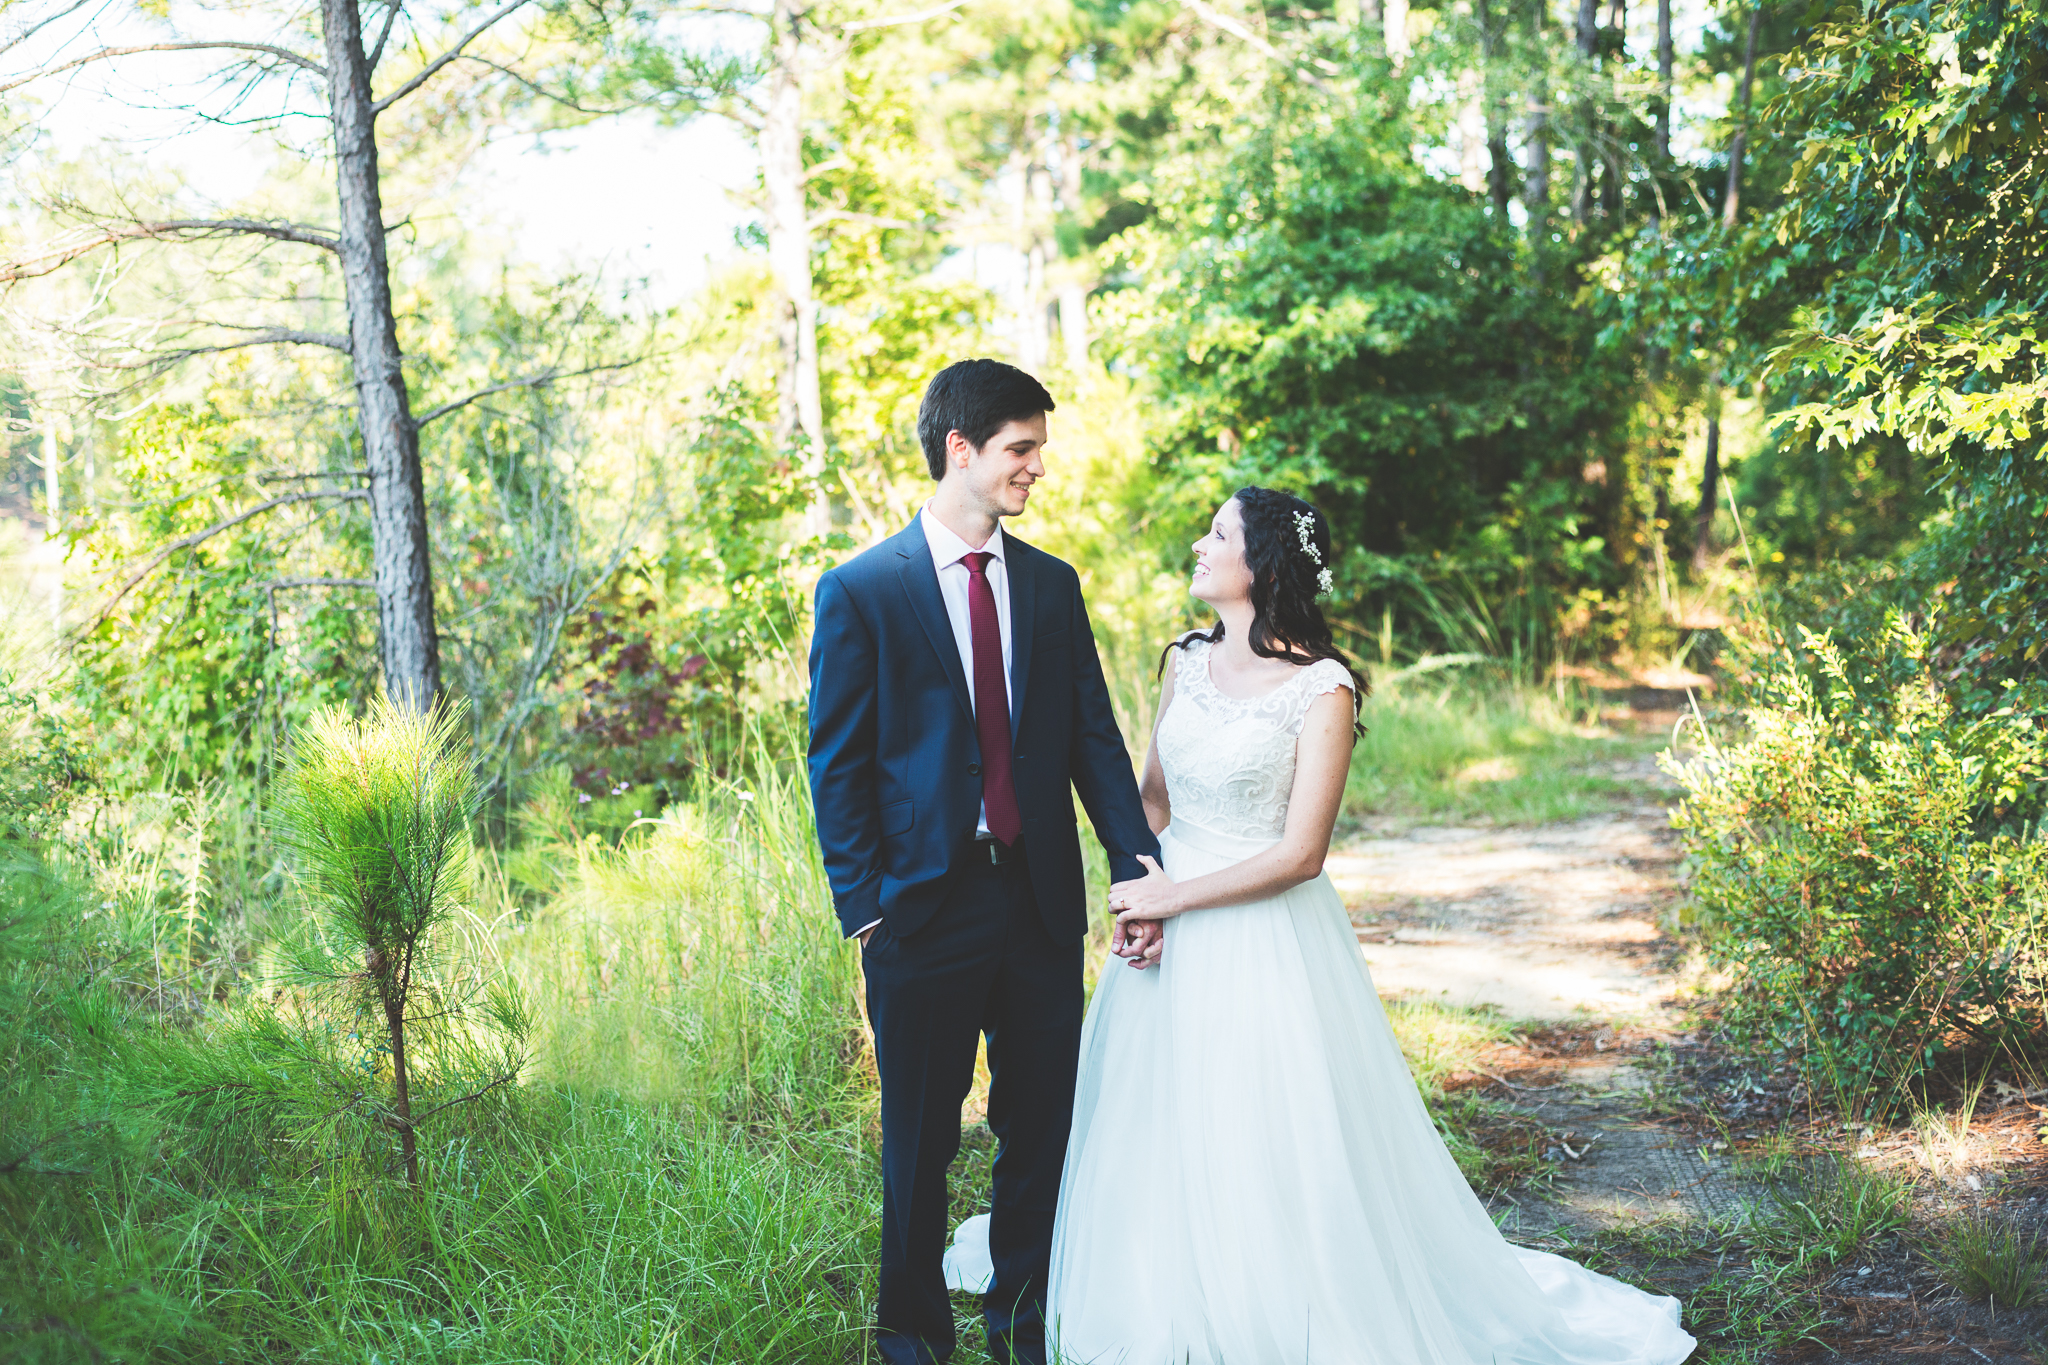 Wedding - Samuel & Jessie Hess_blog-34.jpg